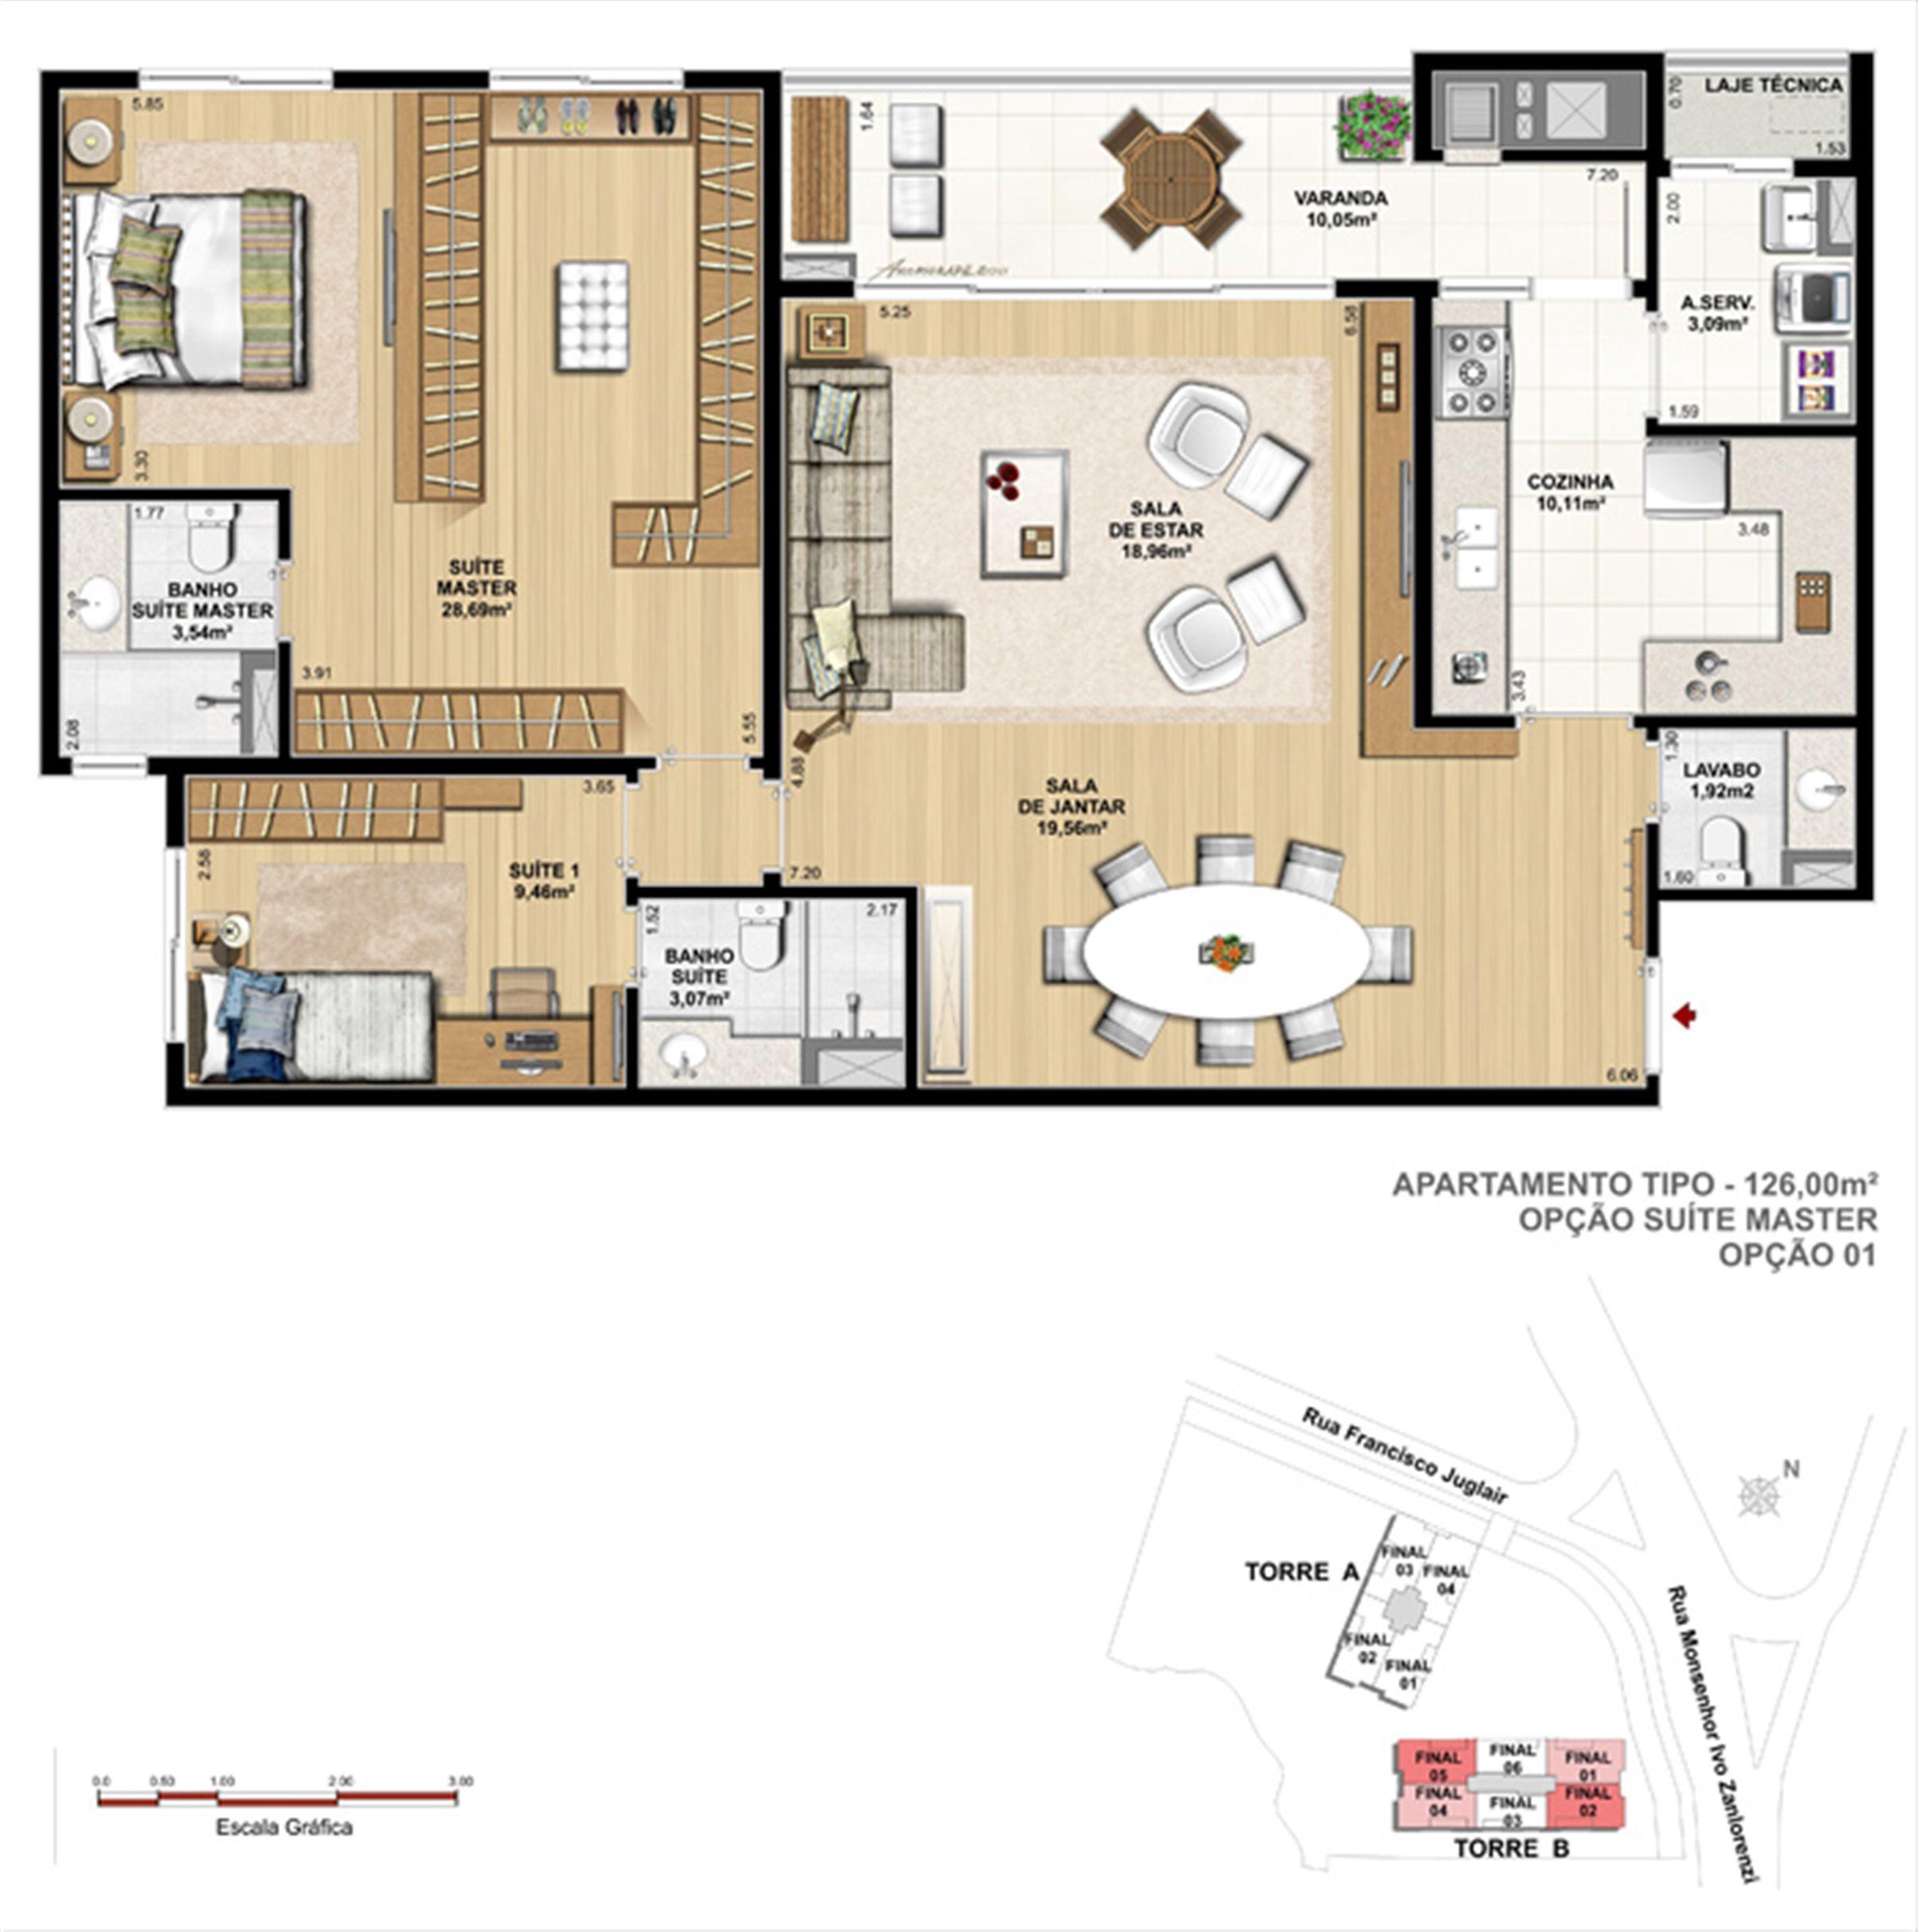 Torre 2 - 2 suítes | Reserva Juglair Ecoville – Apartamento no  Ecoville - Curitiba - Paraná